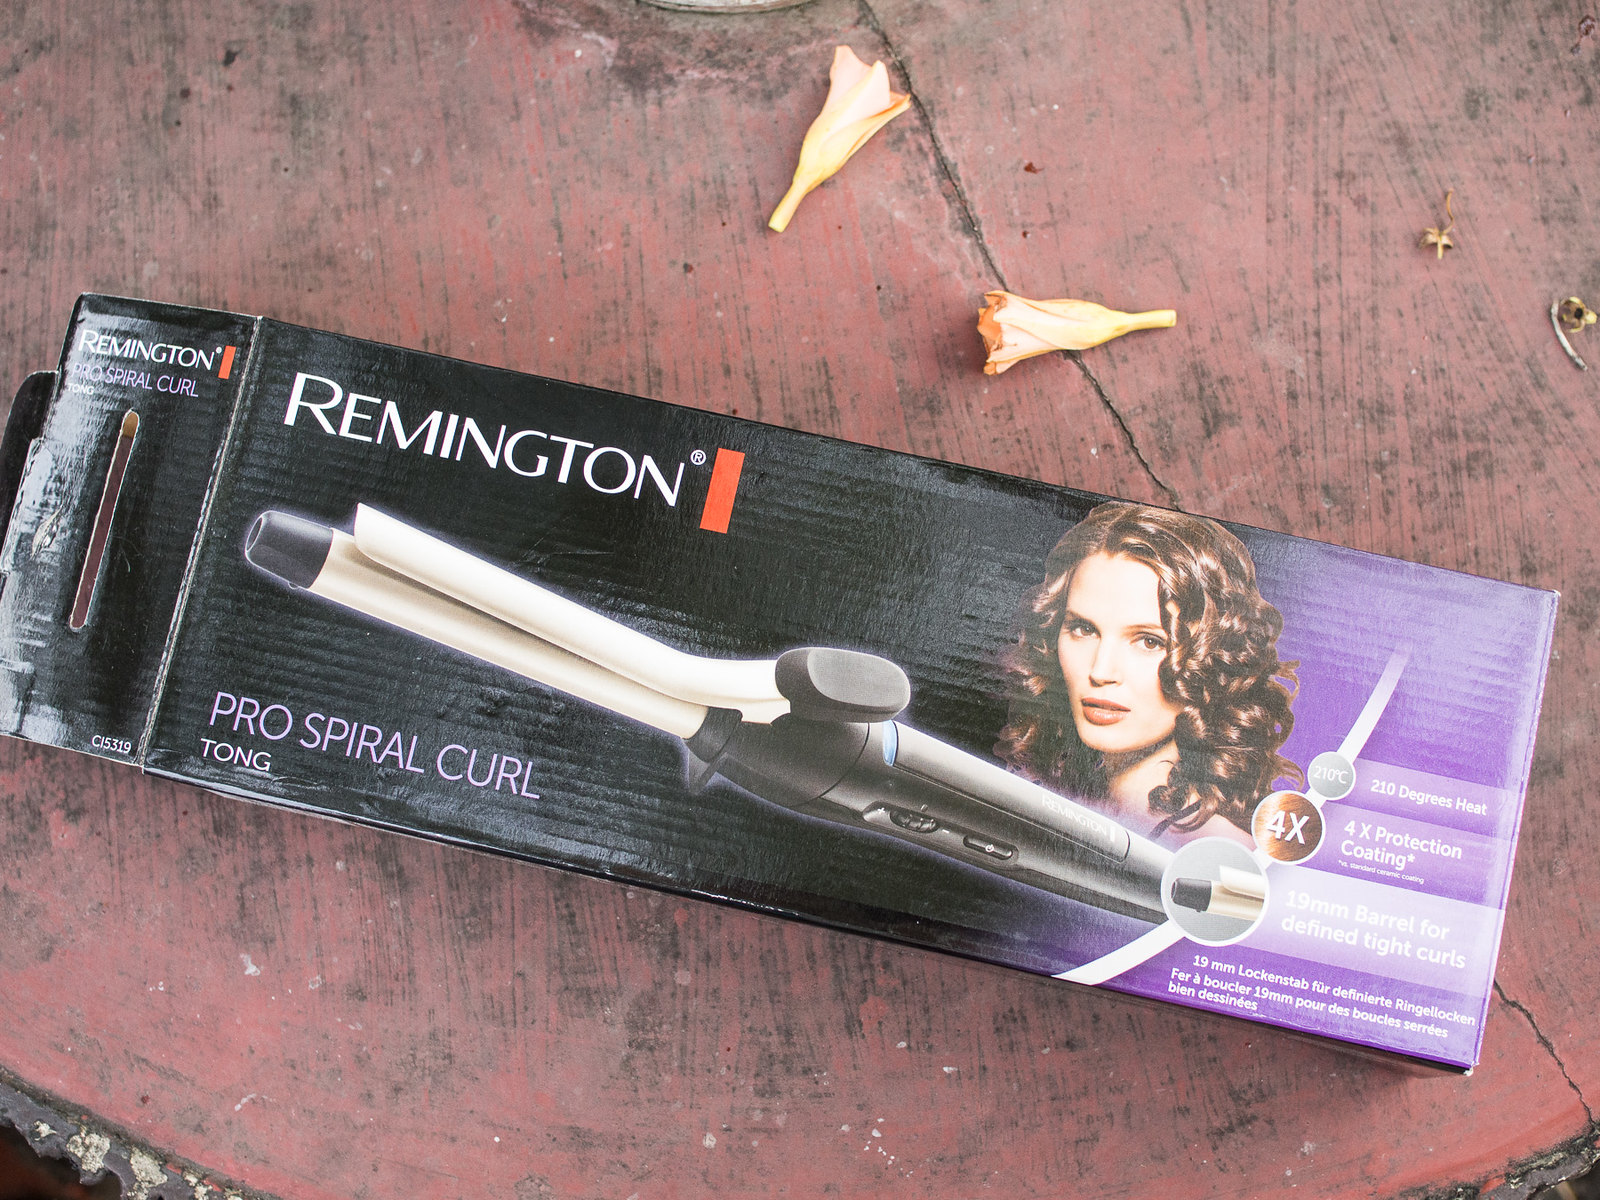 remington-pro-spiral-curl